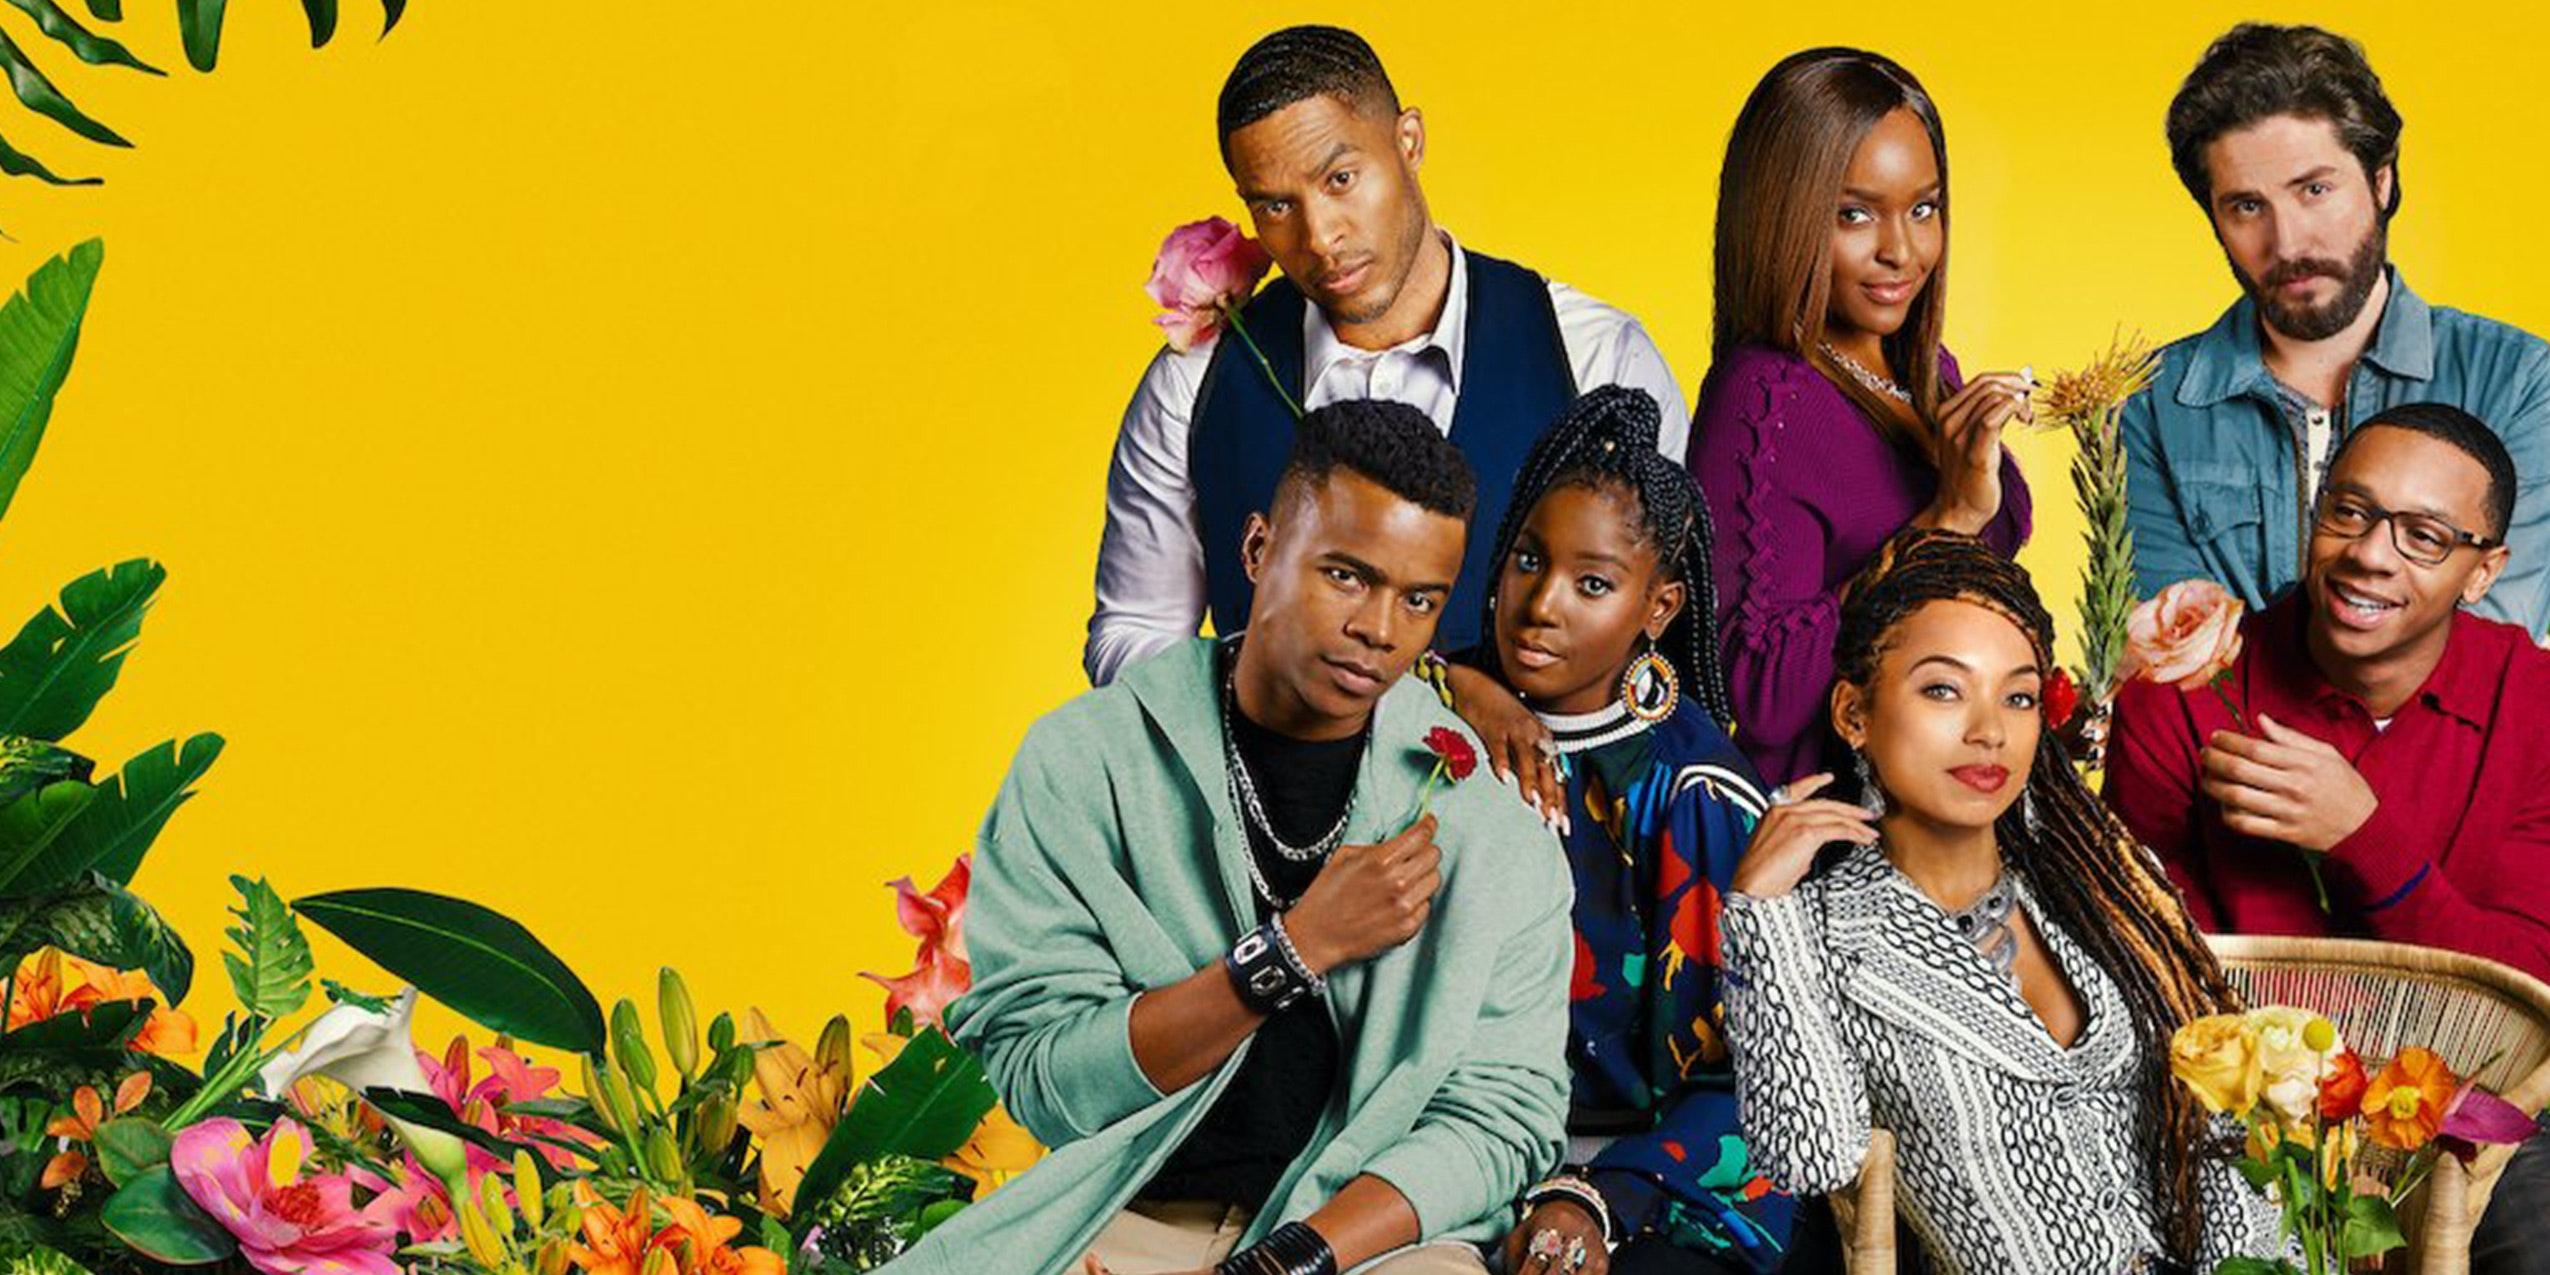 dear white people Netflix original series